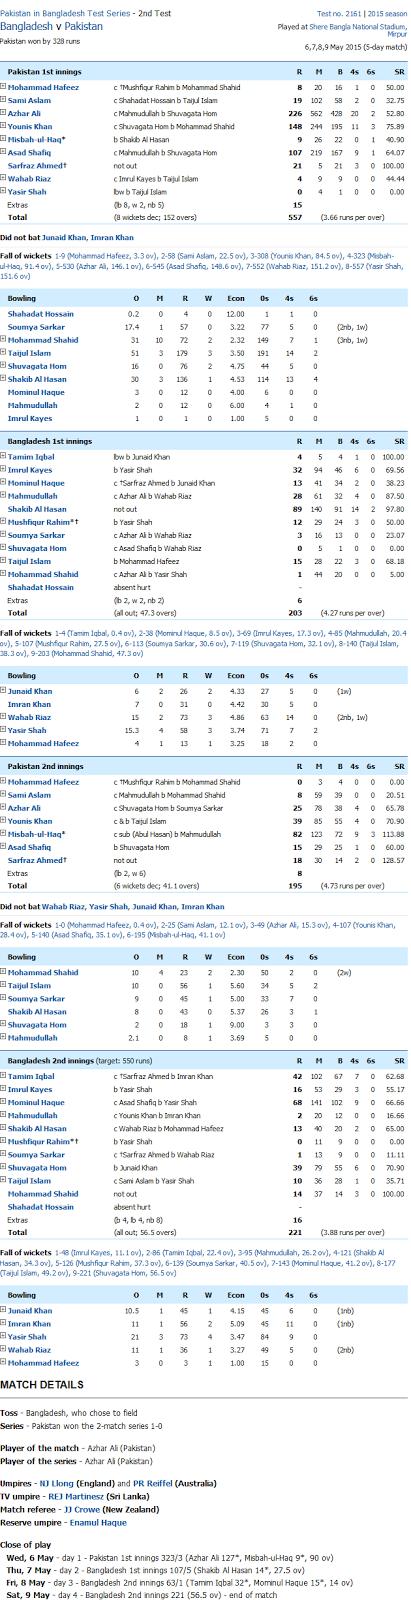 Pakistan vs Bangladesh Test Match Series